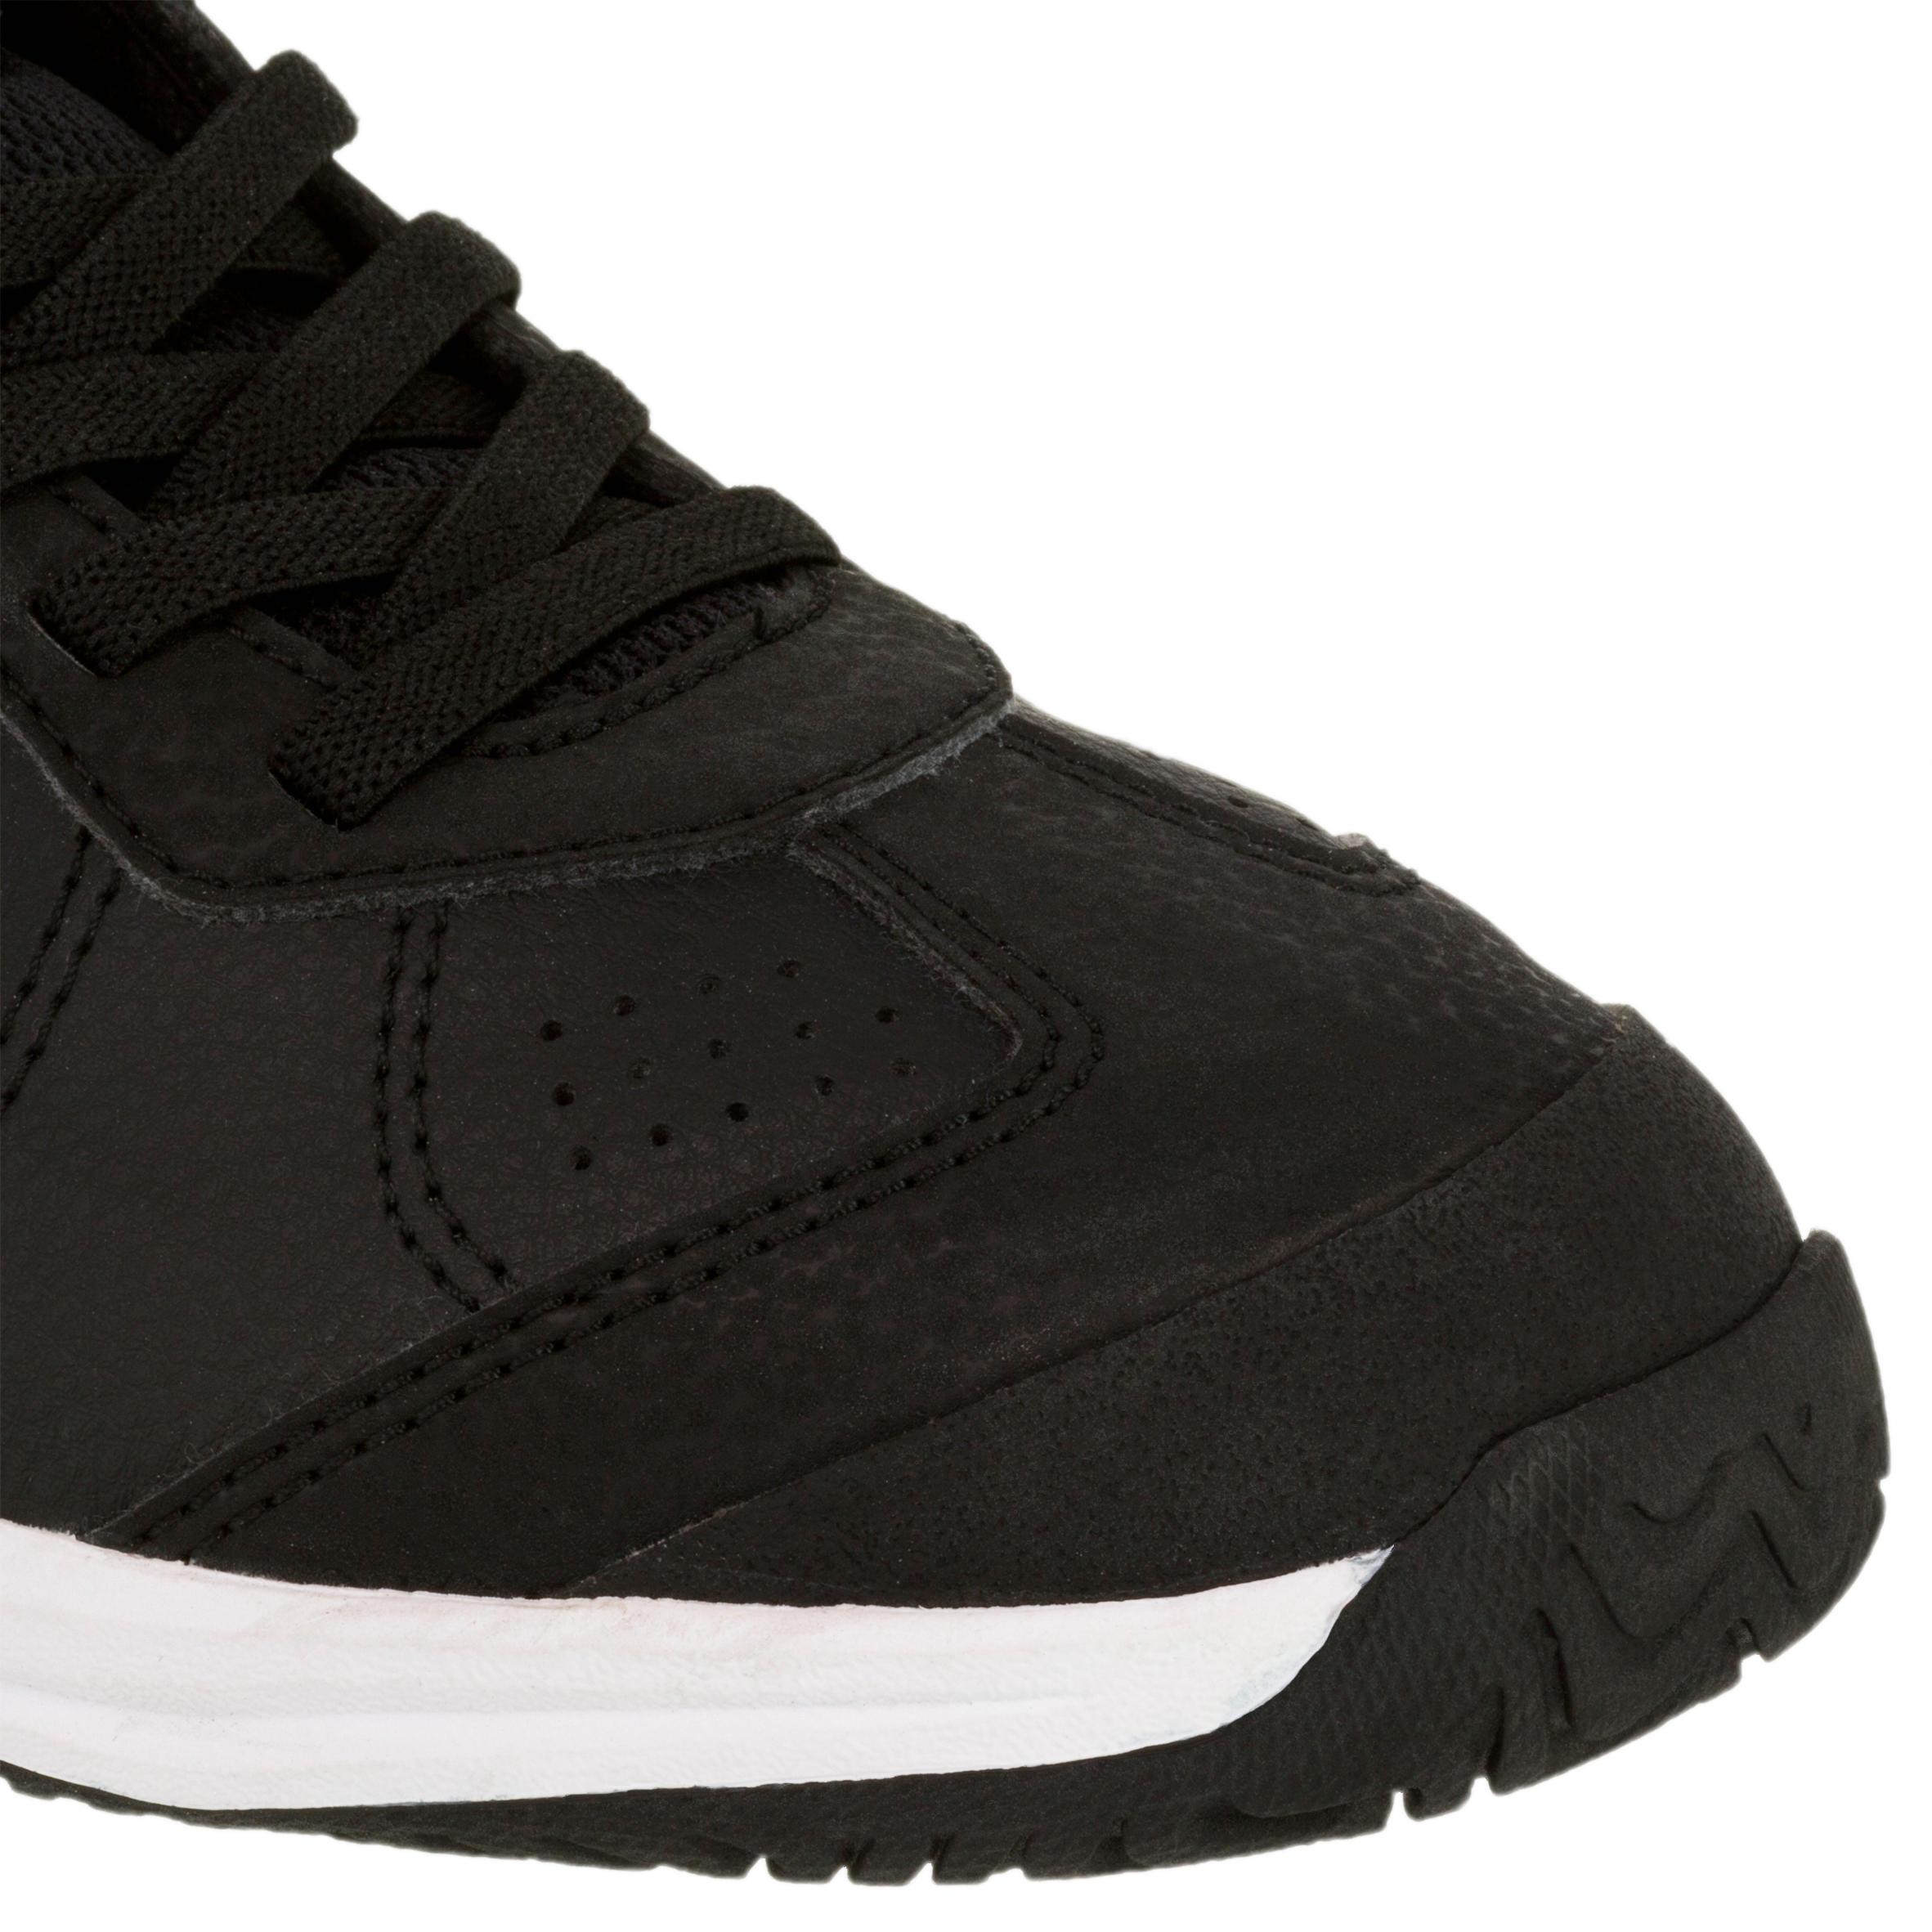 TS160 Kids Tennis Shoes - Black/Beetle Patterns